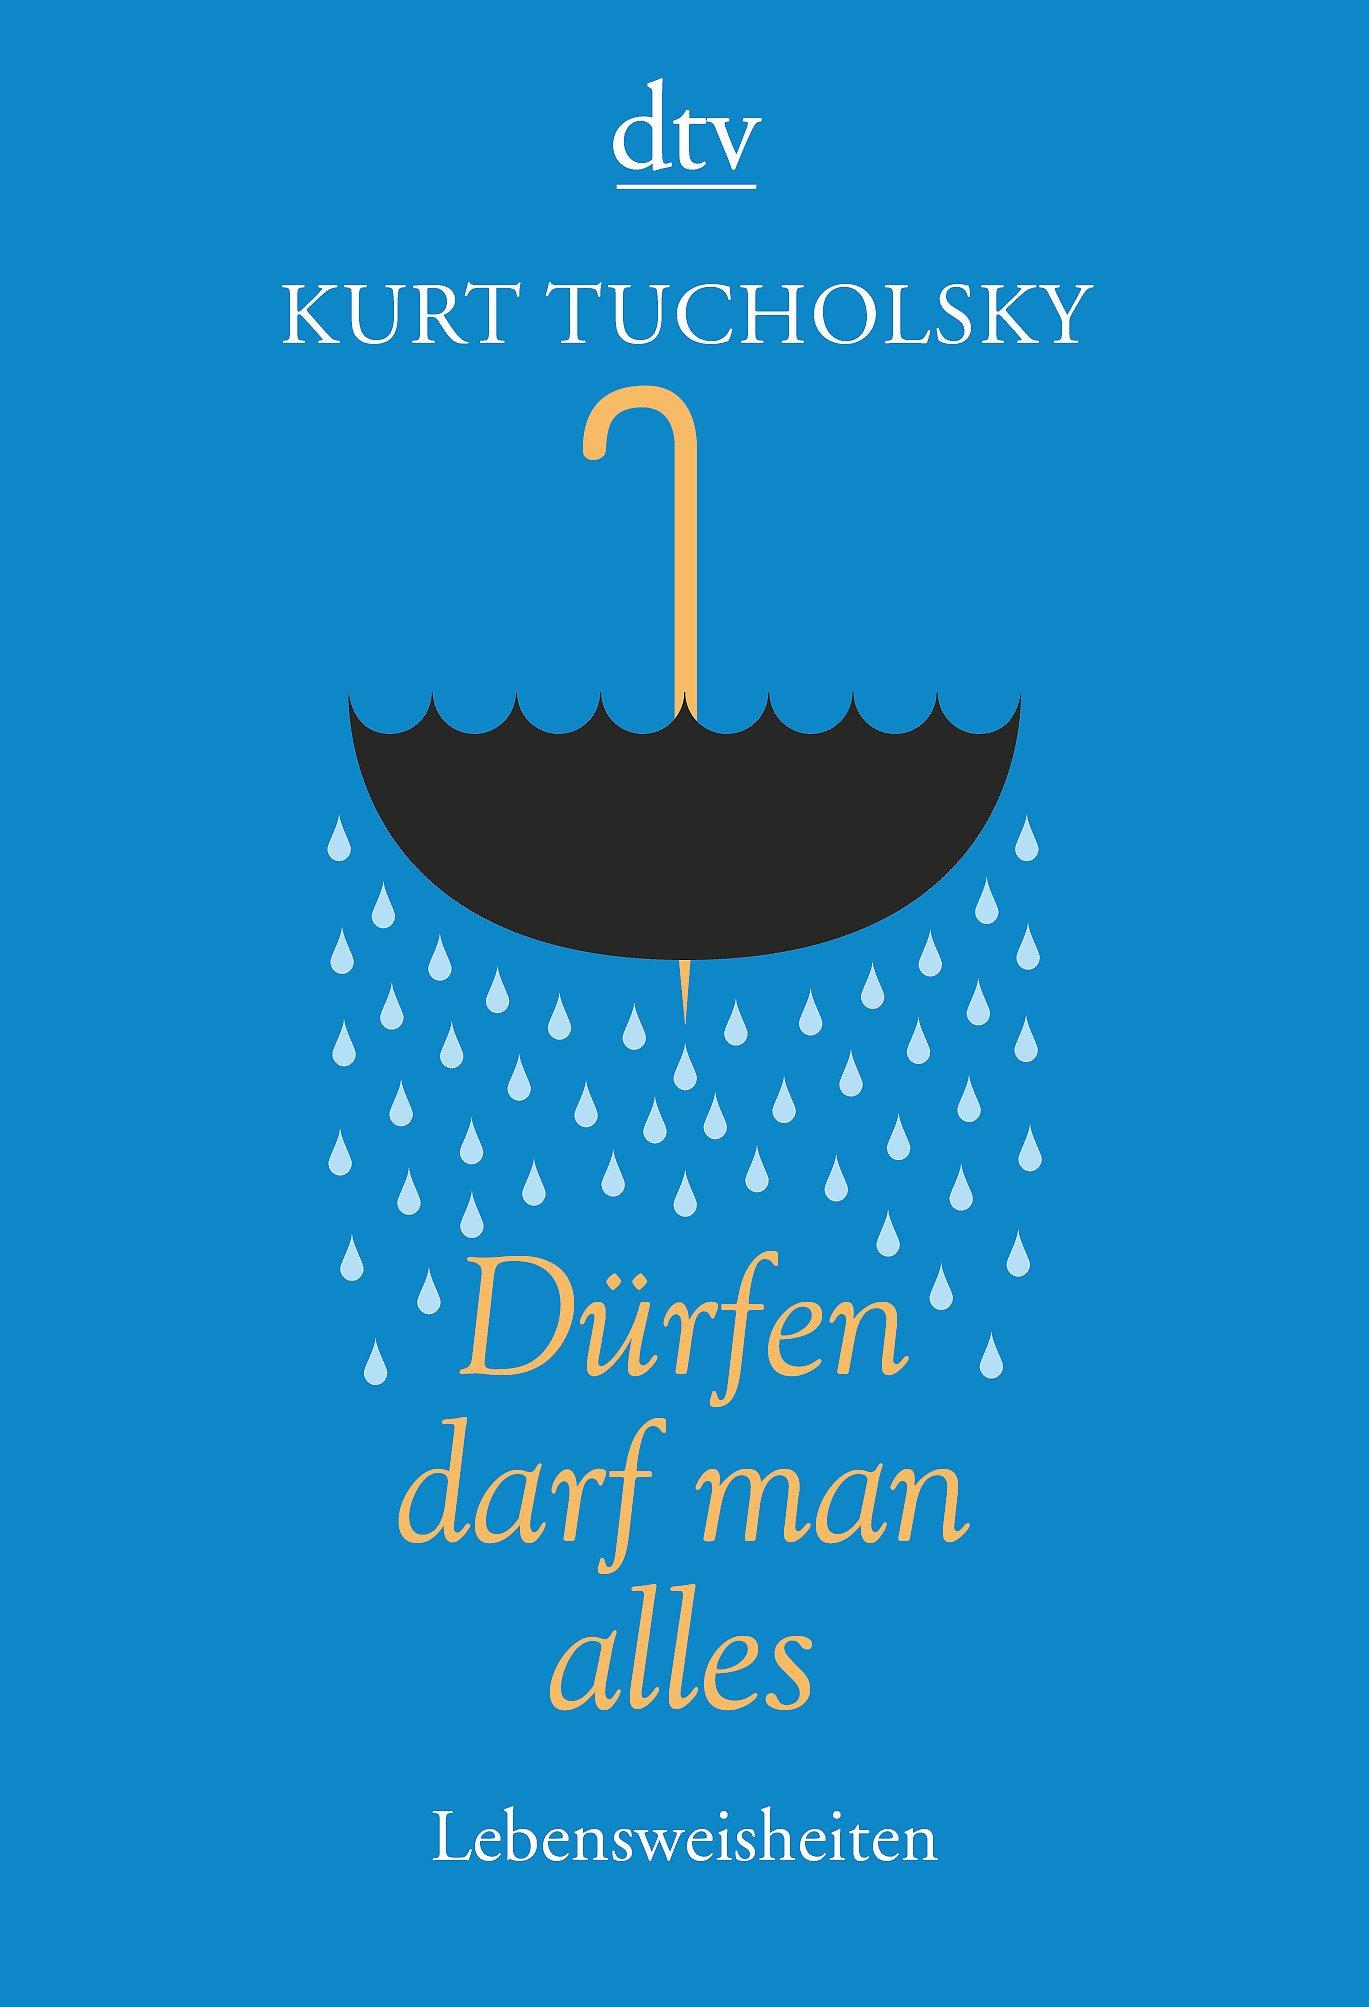 Dürfen darf man alles: Lebensweisheiten: Amazon.de: Günter Stolzenberger, Kurt  Tucholsky: Bücher